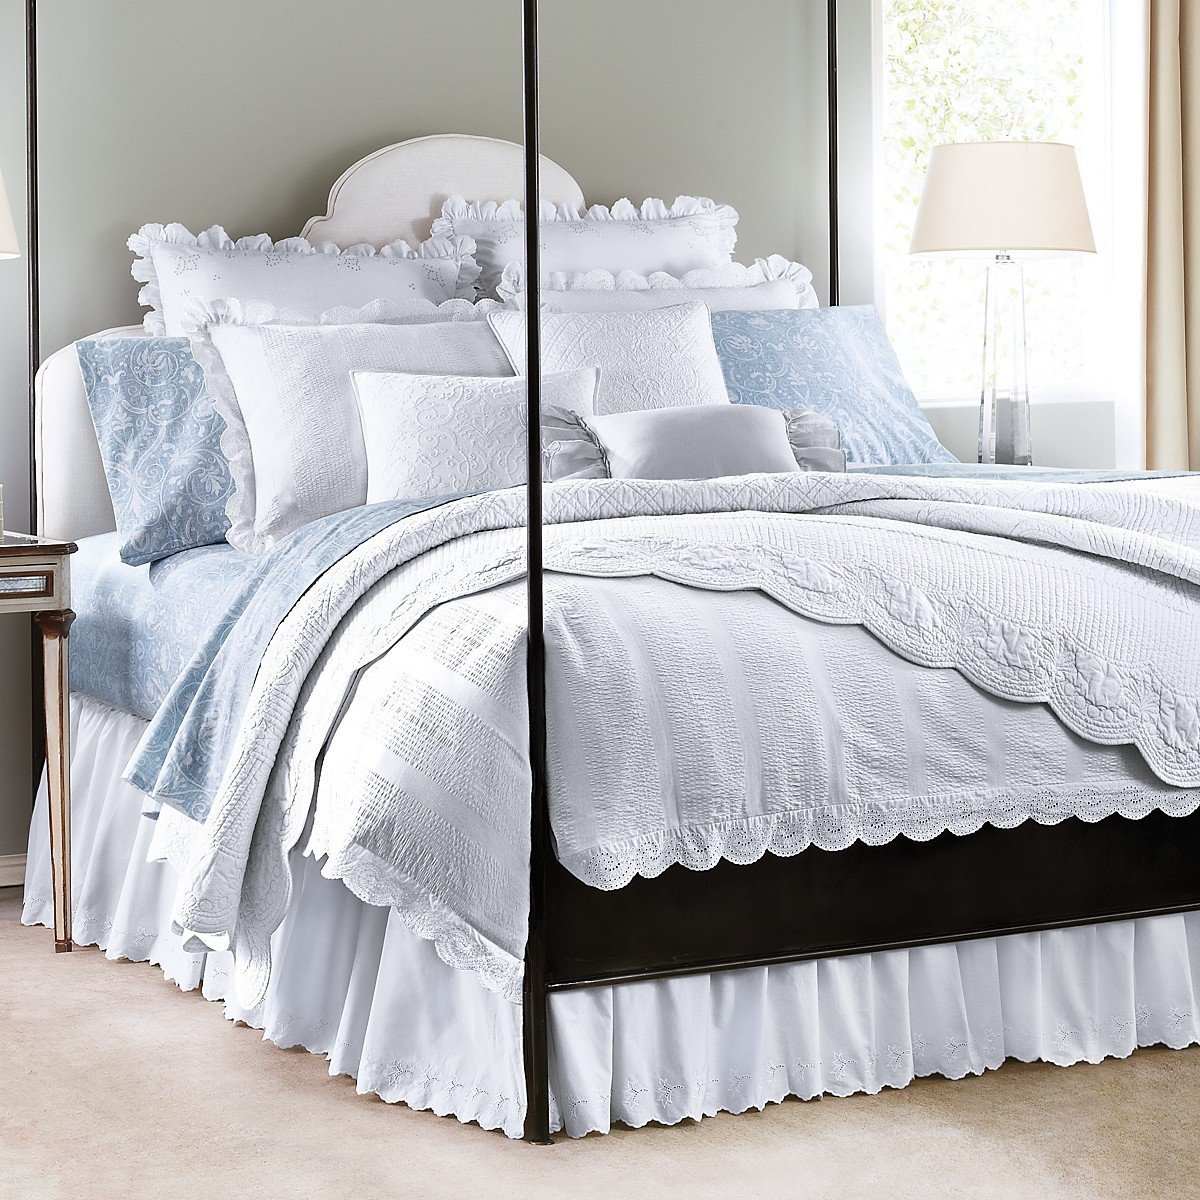 Amazon.com: Lauren By Ralph Lauren Spring Hill Bedding Blue U0026 White Floral  Scroll KING Flat Sheet: Home U0026 Kitchen